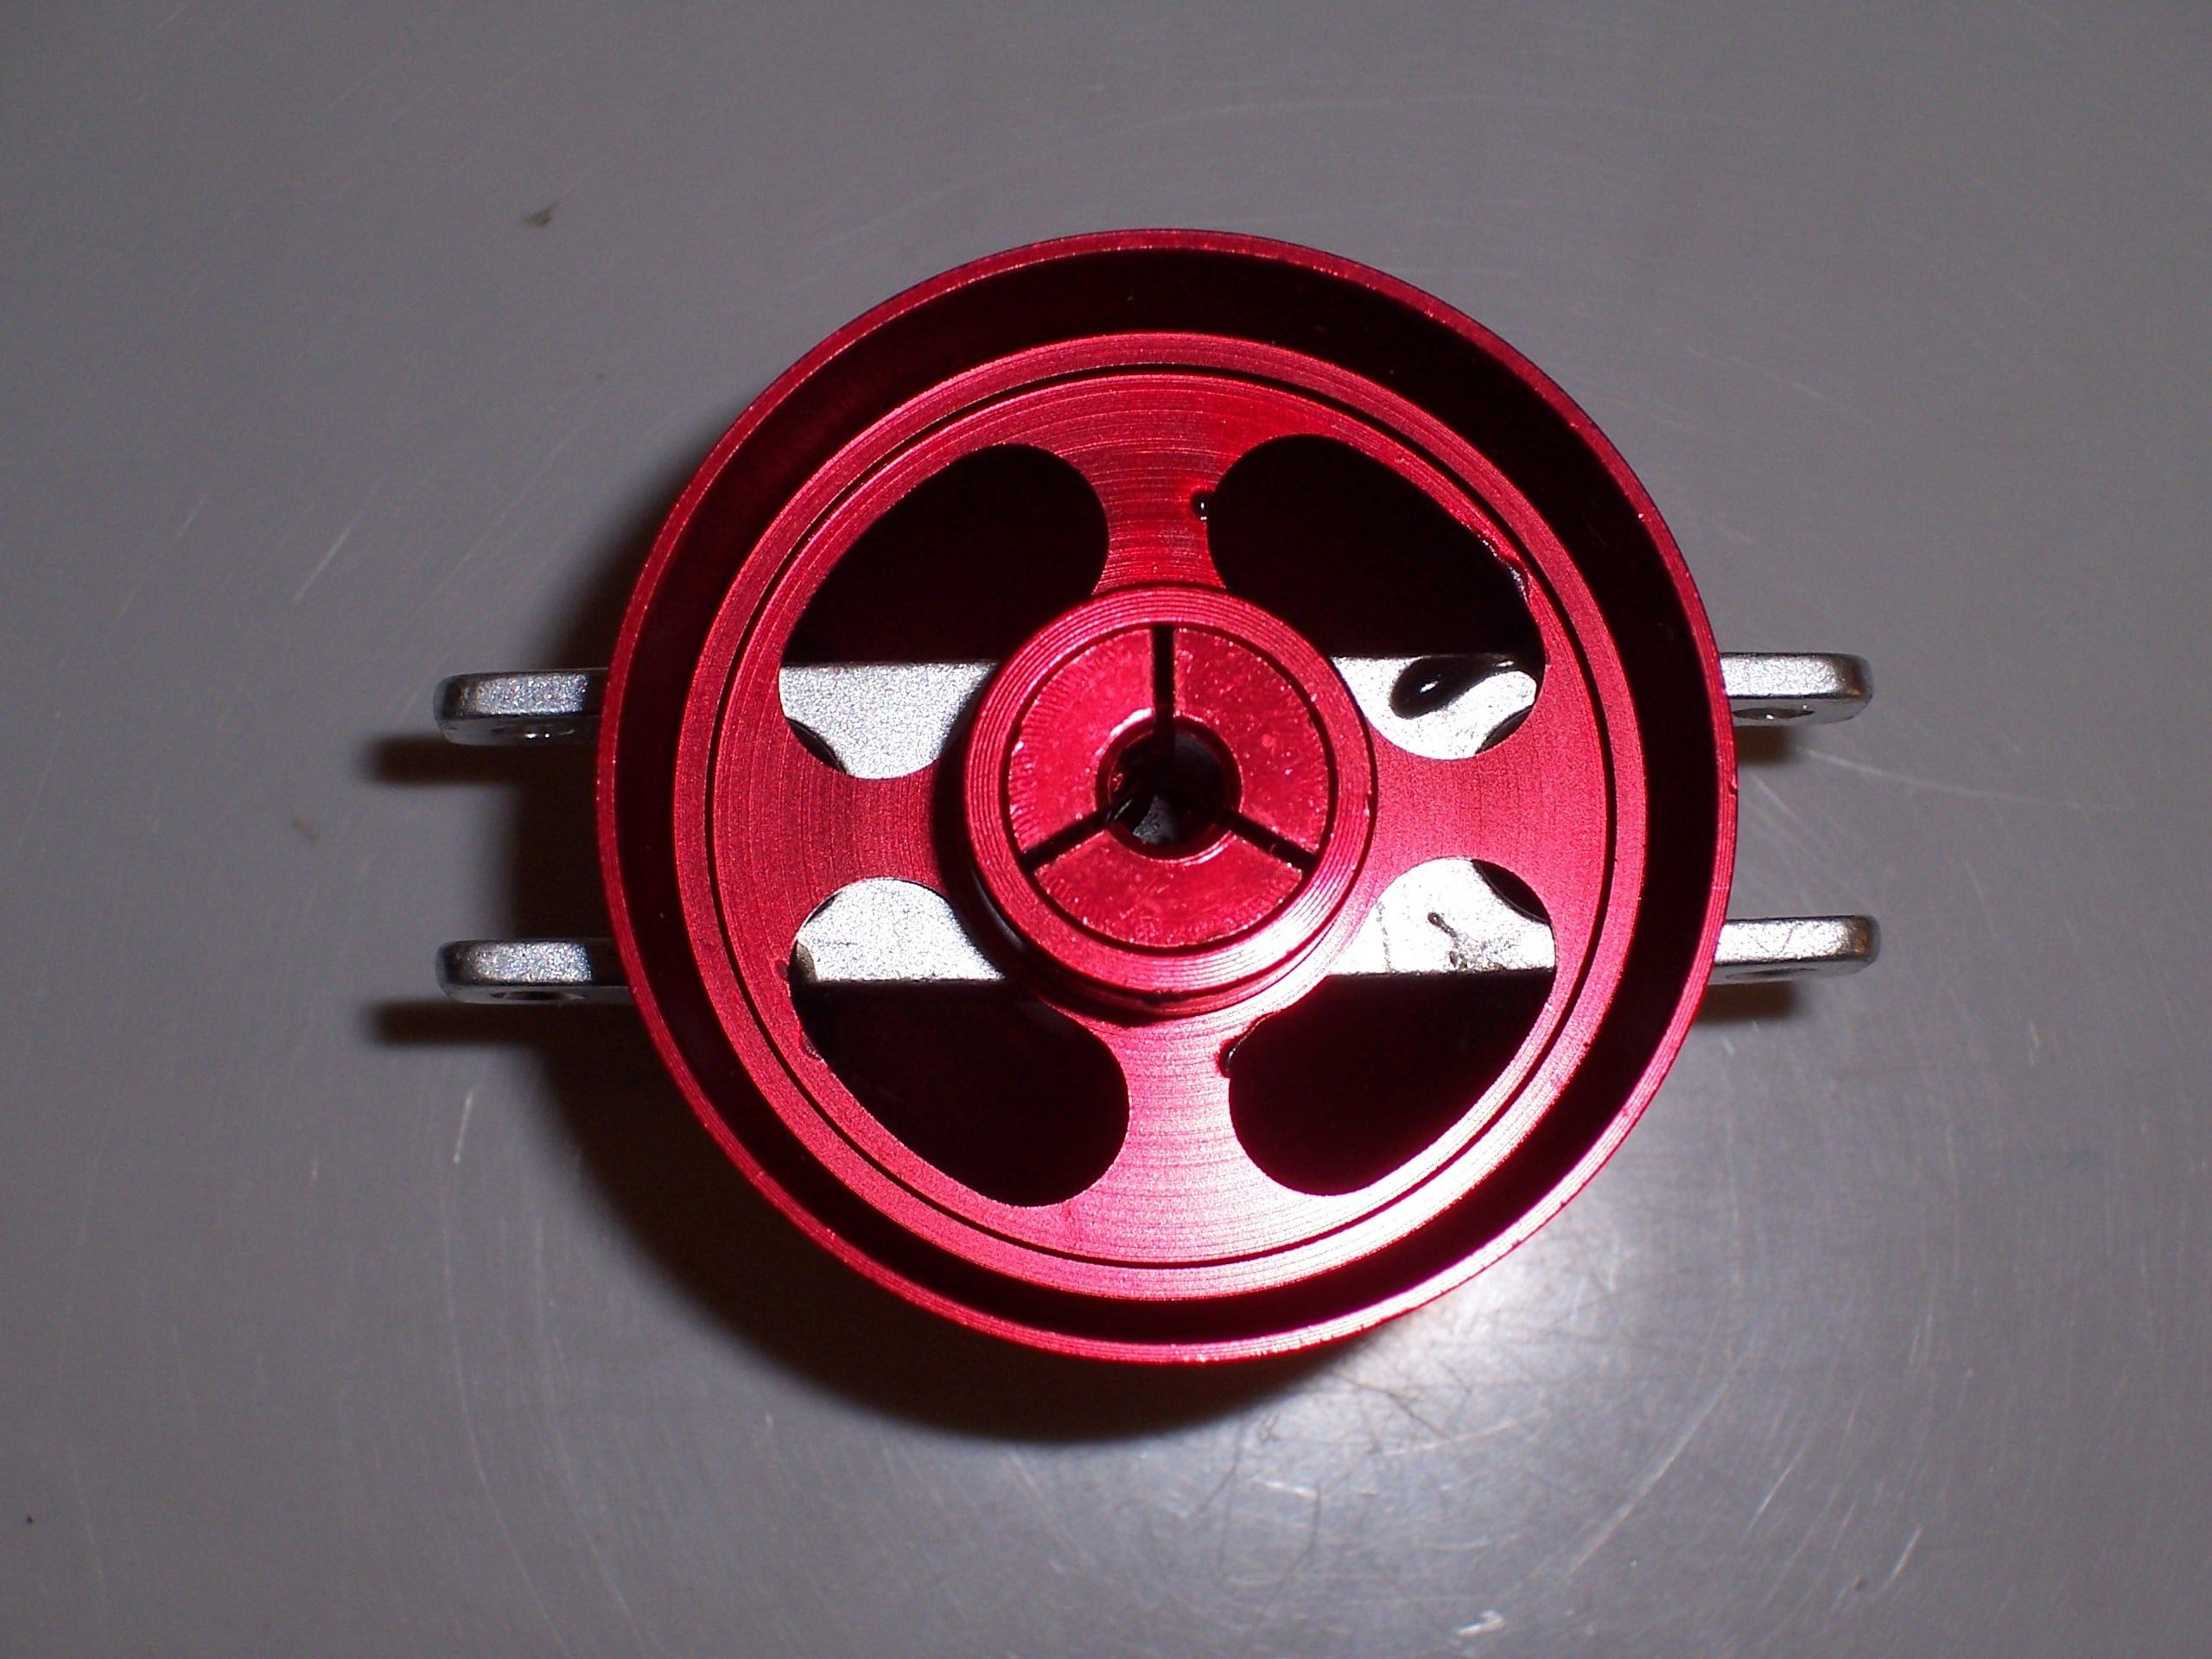 Spinner 40 3,2 offen Alu rot eloxiert